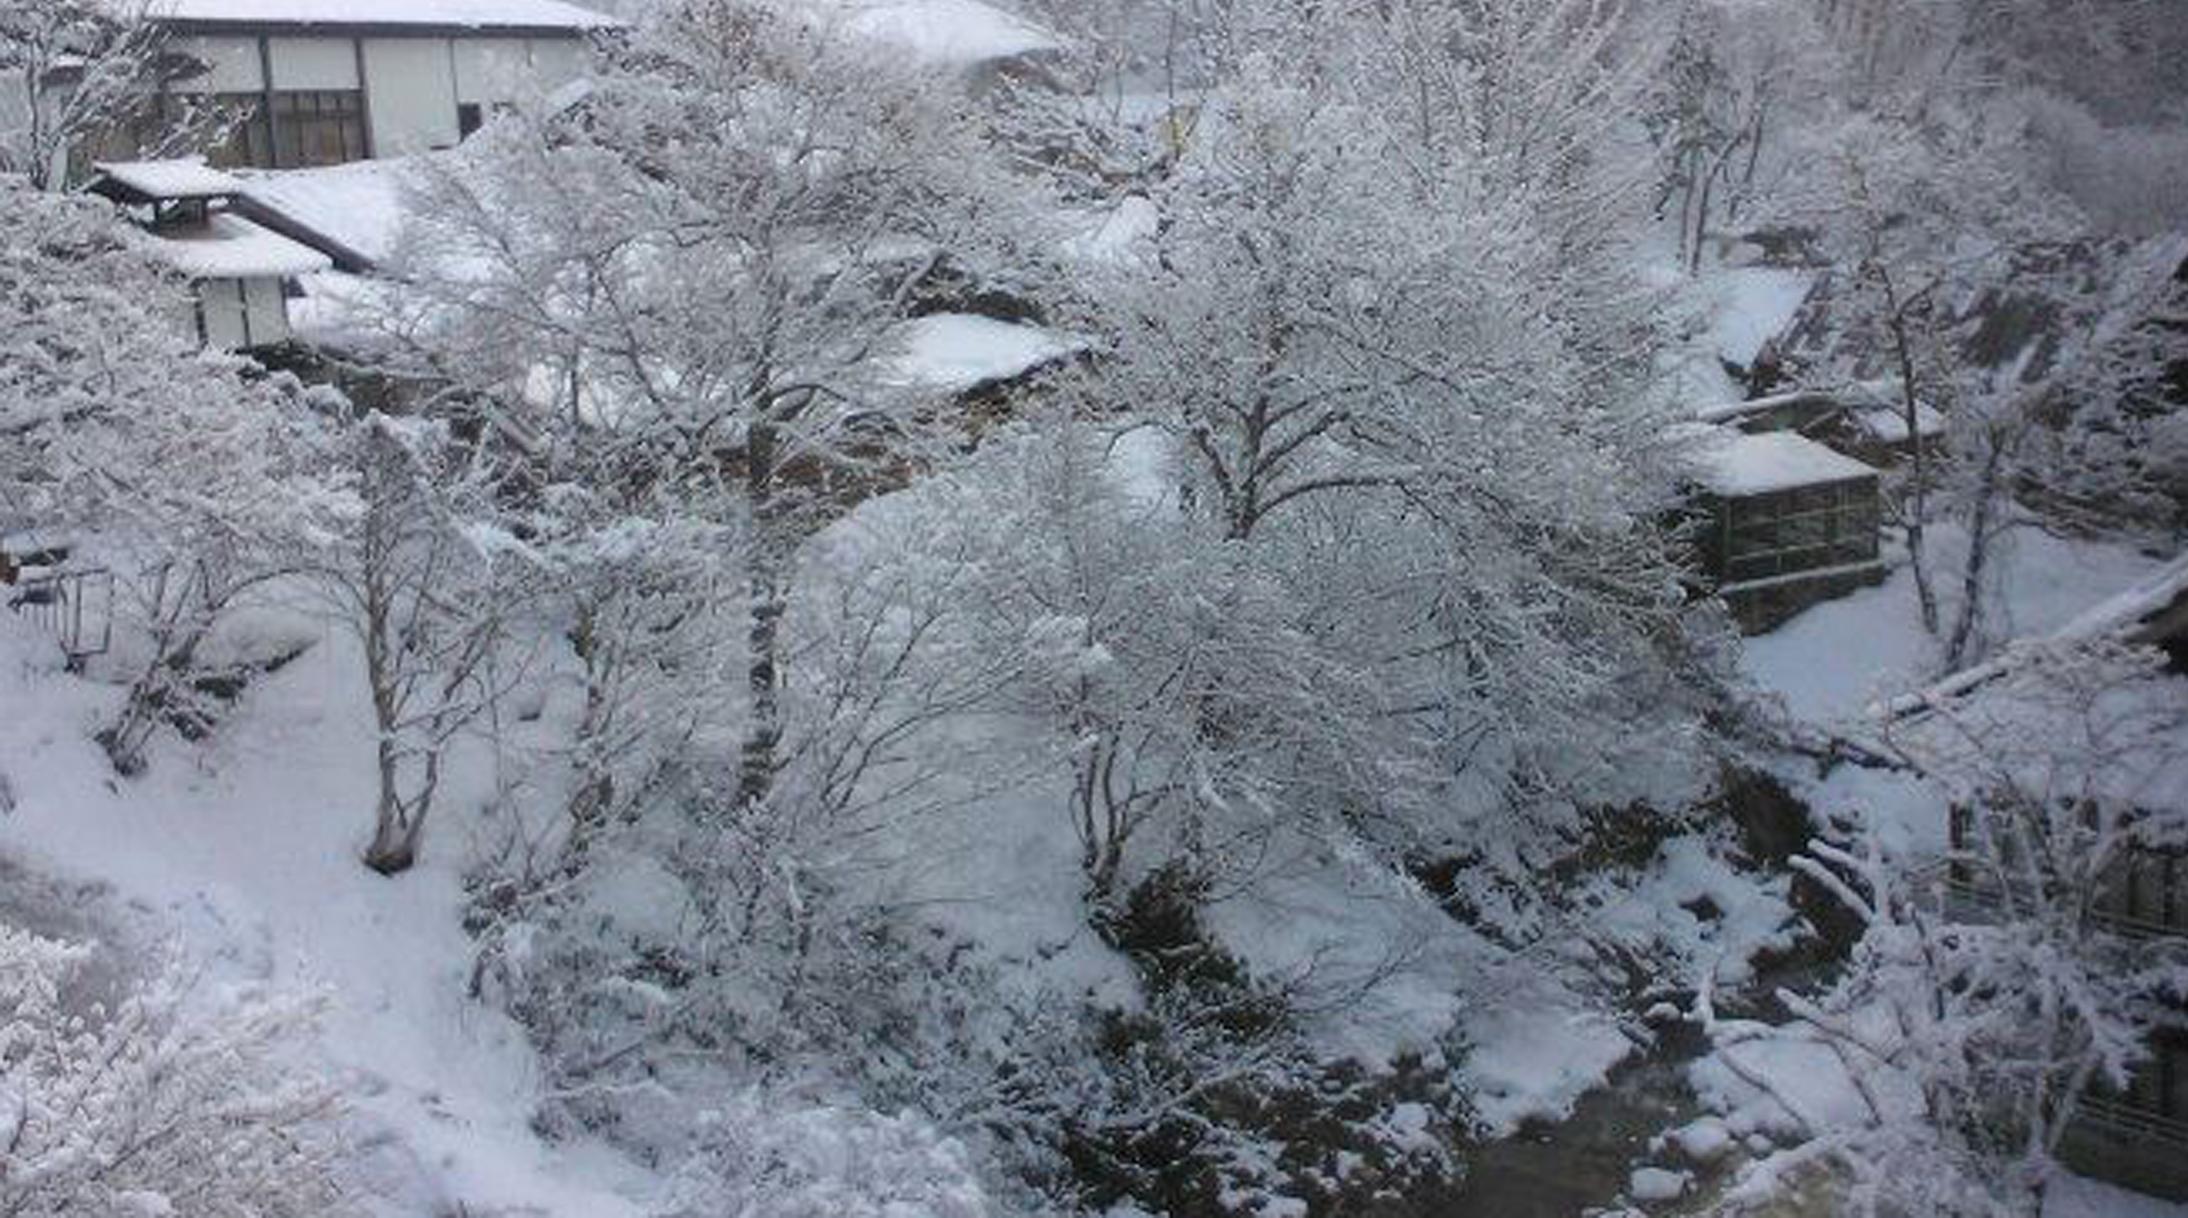 onsen in winter